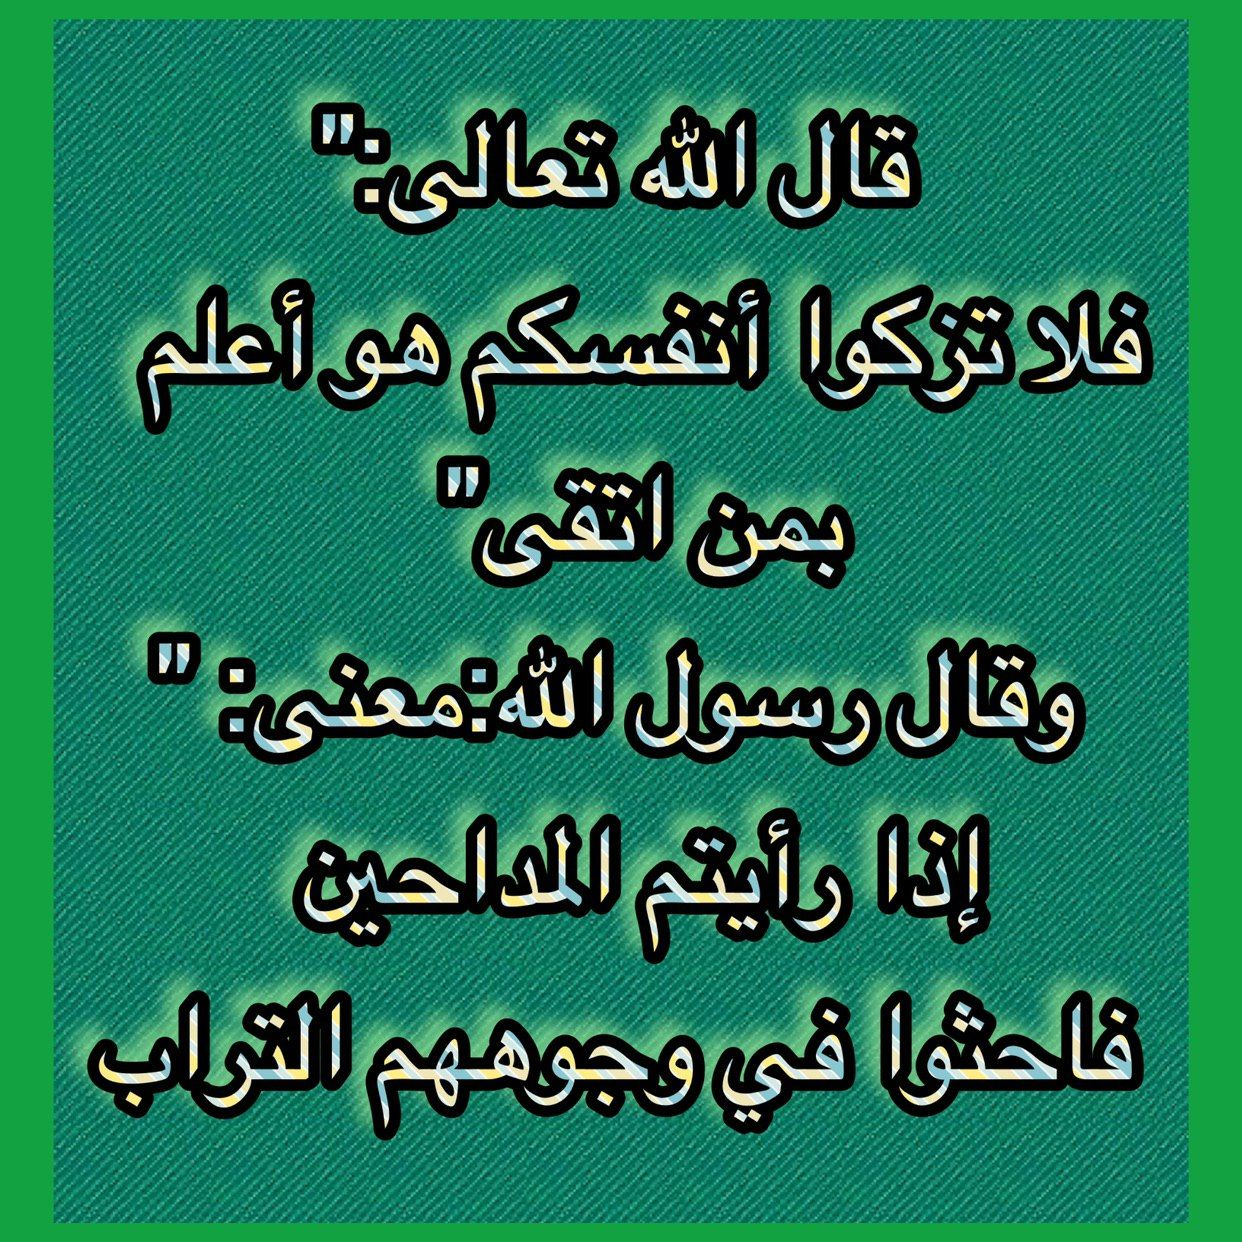 قال الله تعالى Arabic Calligraphy Calligraphy